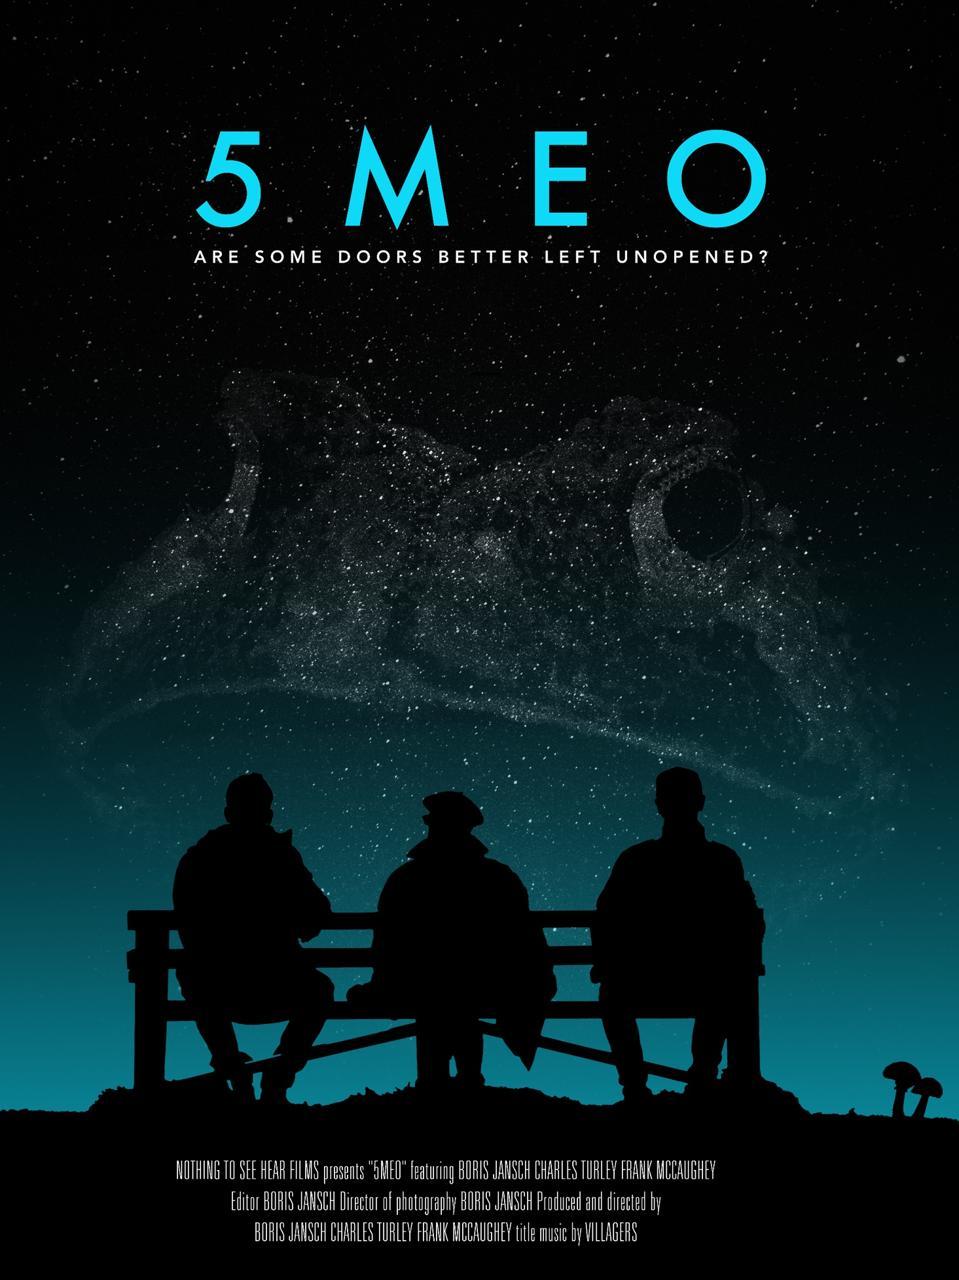 5-meo-dmt toad venom